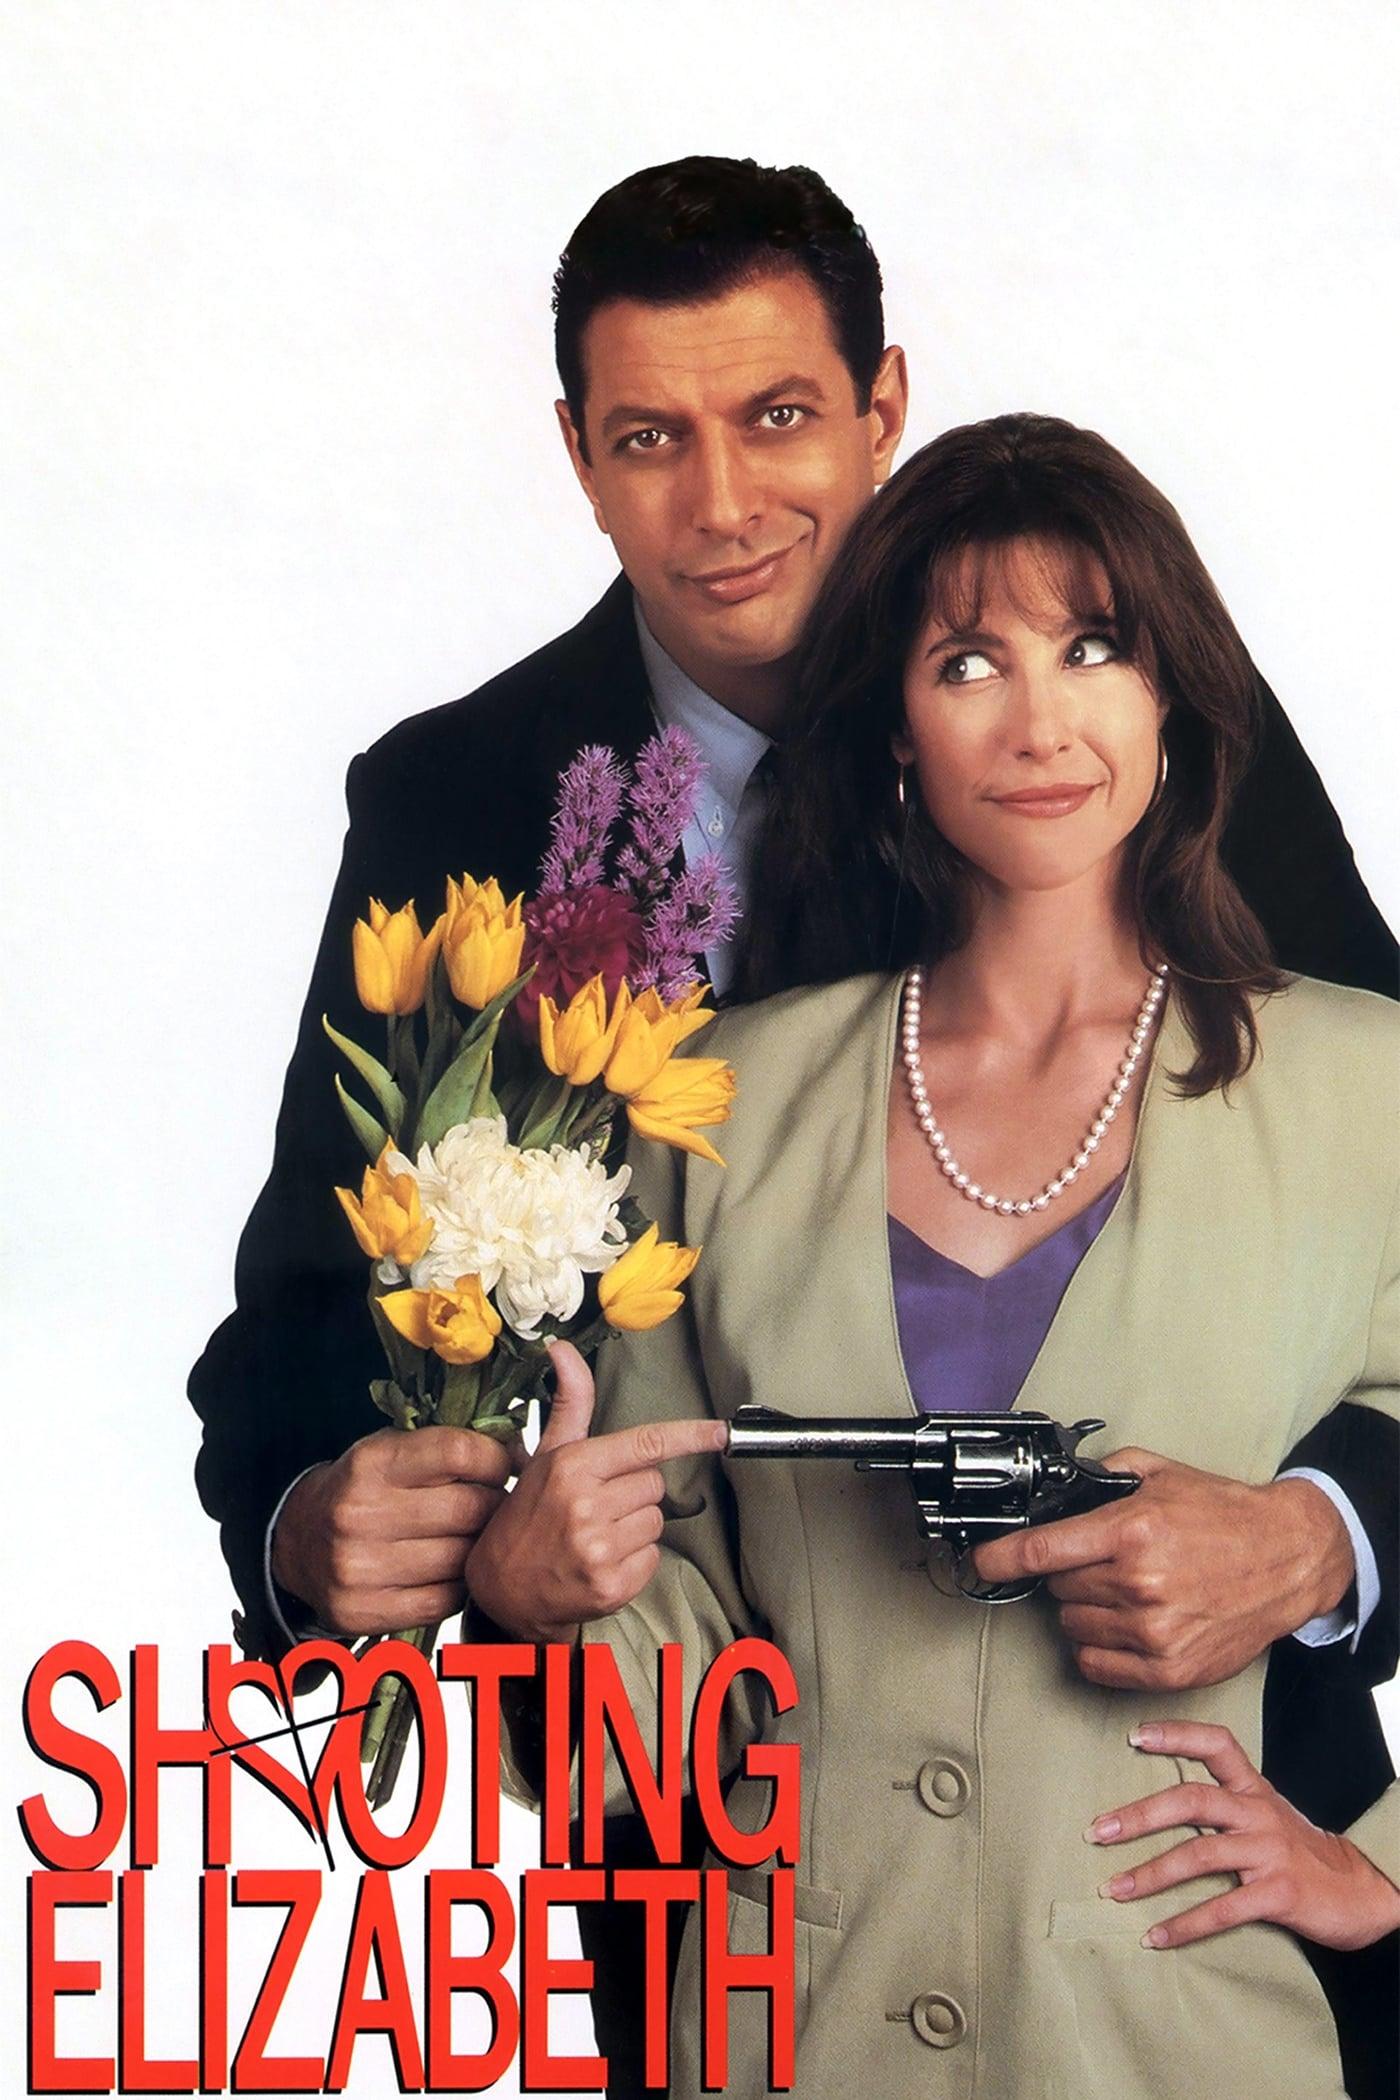 Shooting Elizabeth